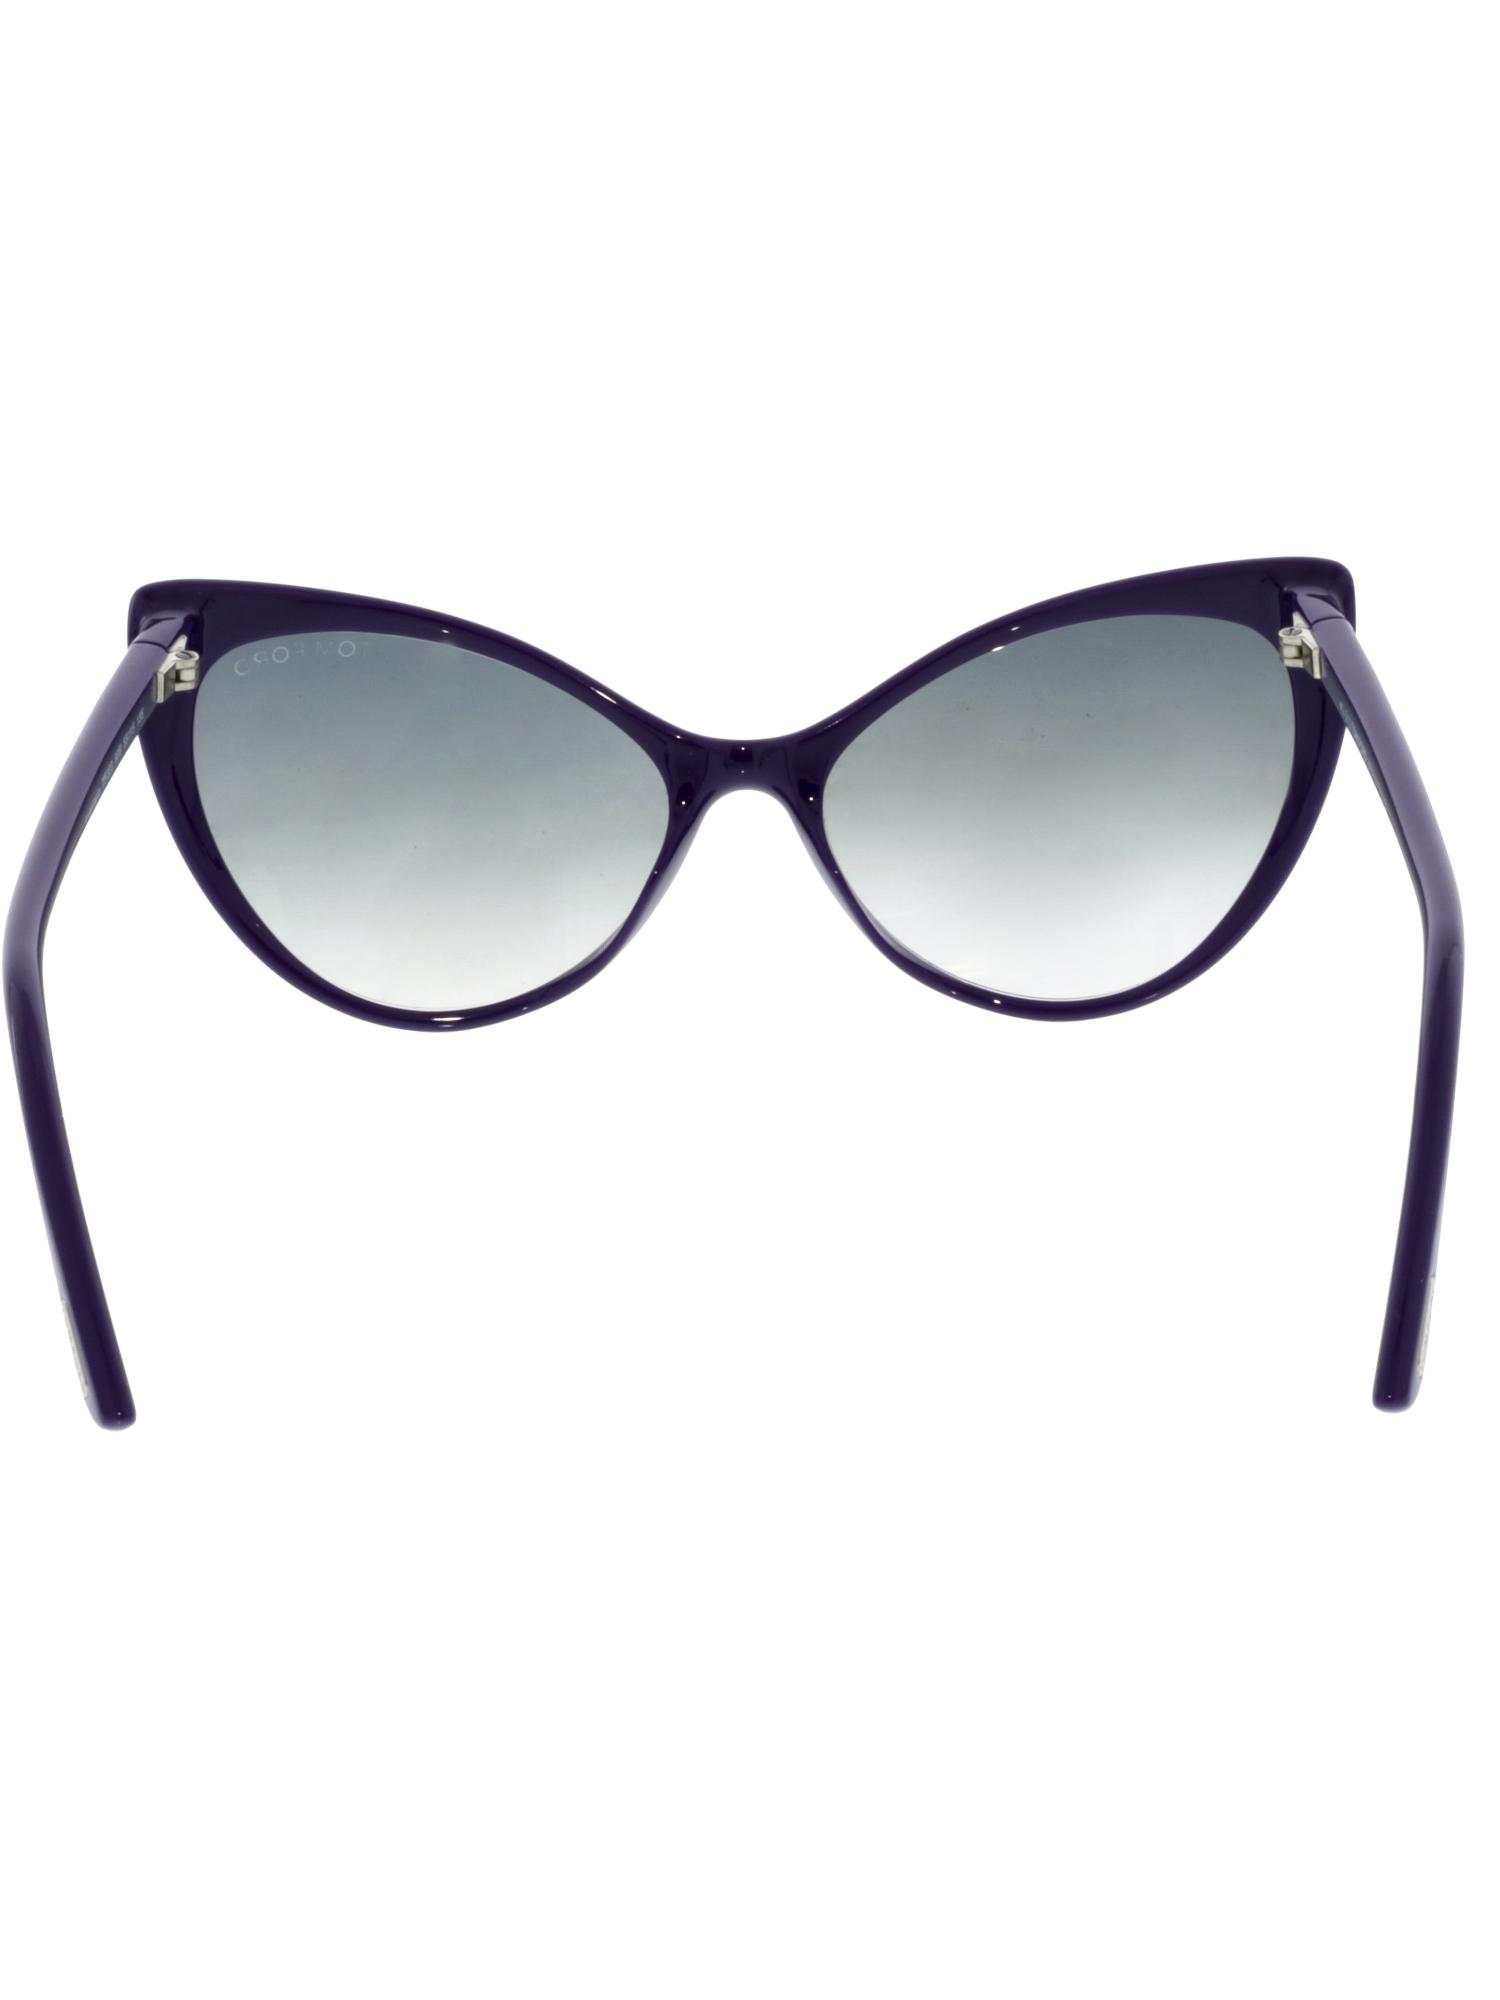 6e719f64f0599 Tom Ford Sunglasses Tf303 Anastasia 90b Violet 303 for sale online ...